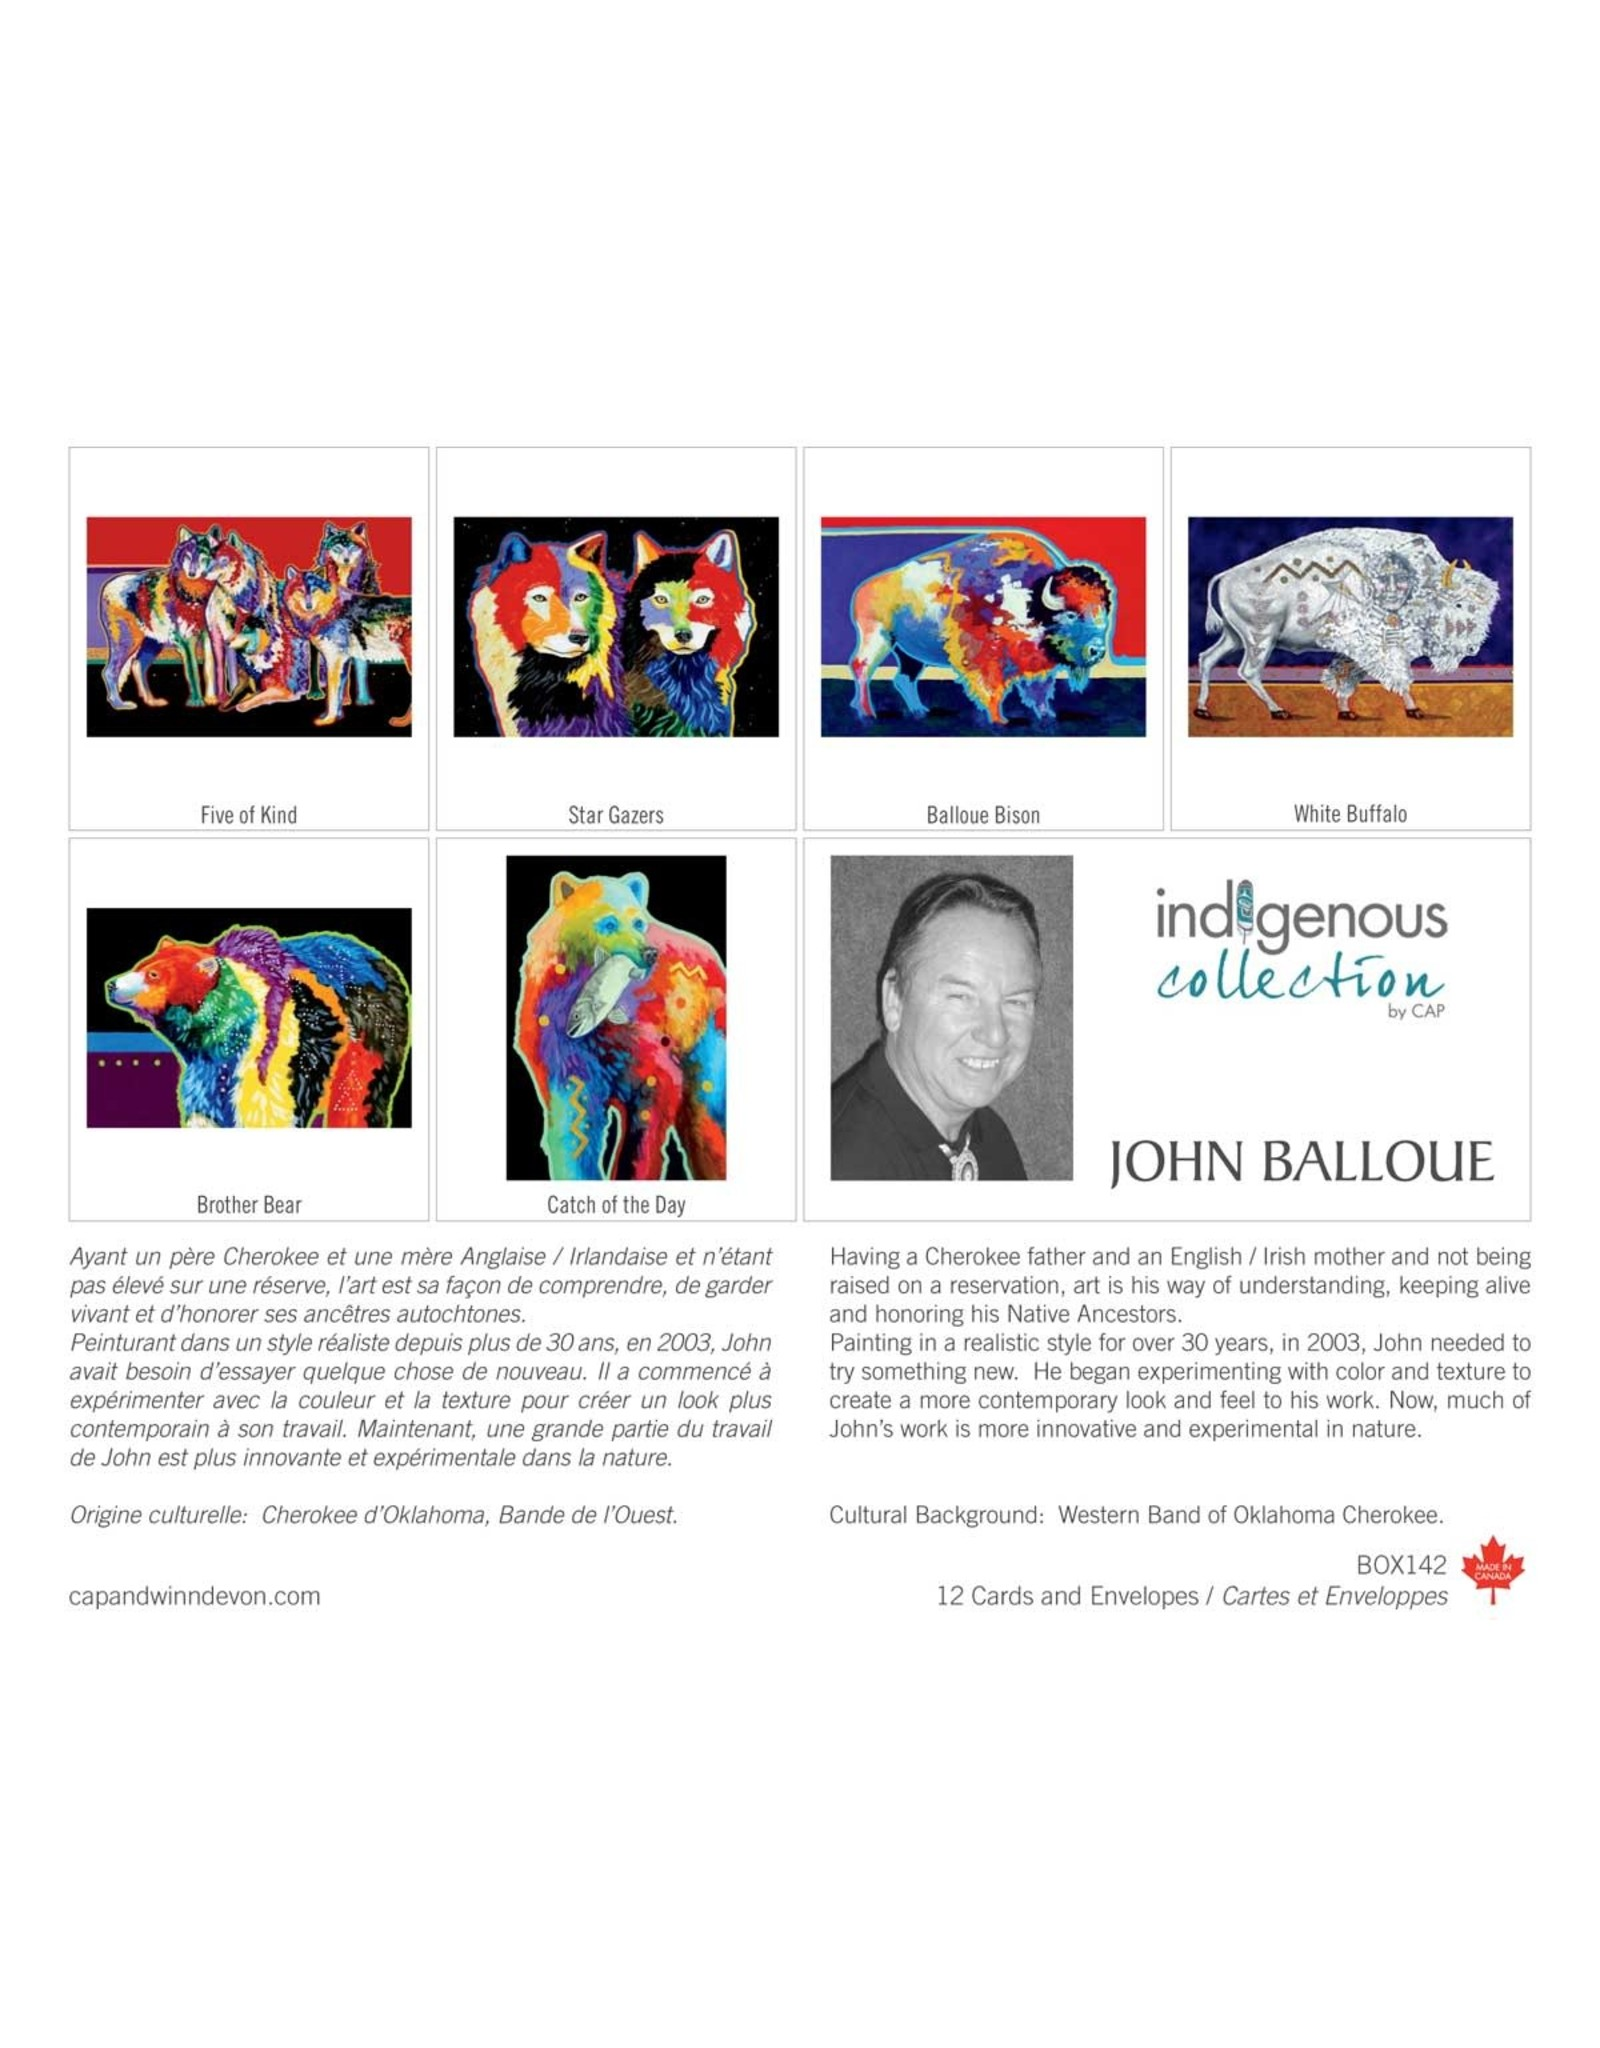 John Balloue 12 Card Box - Box 142